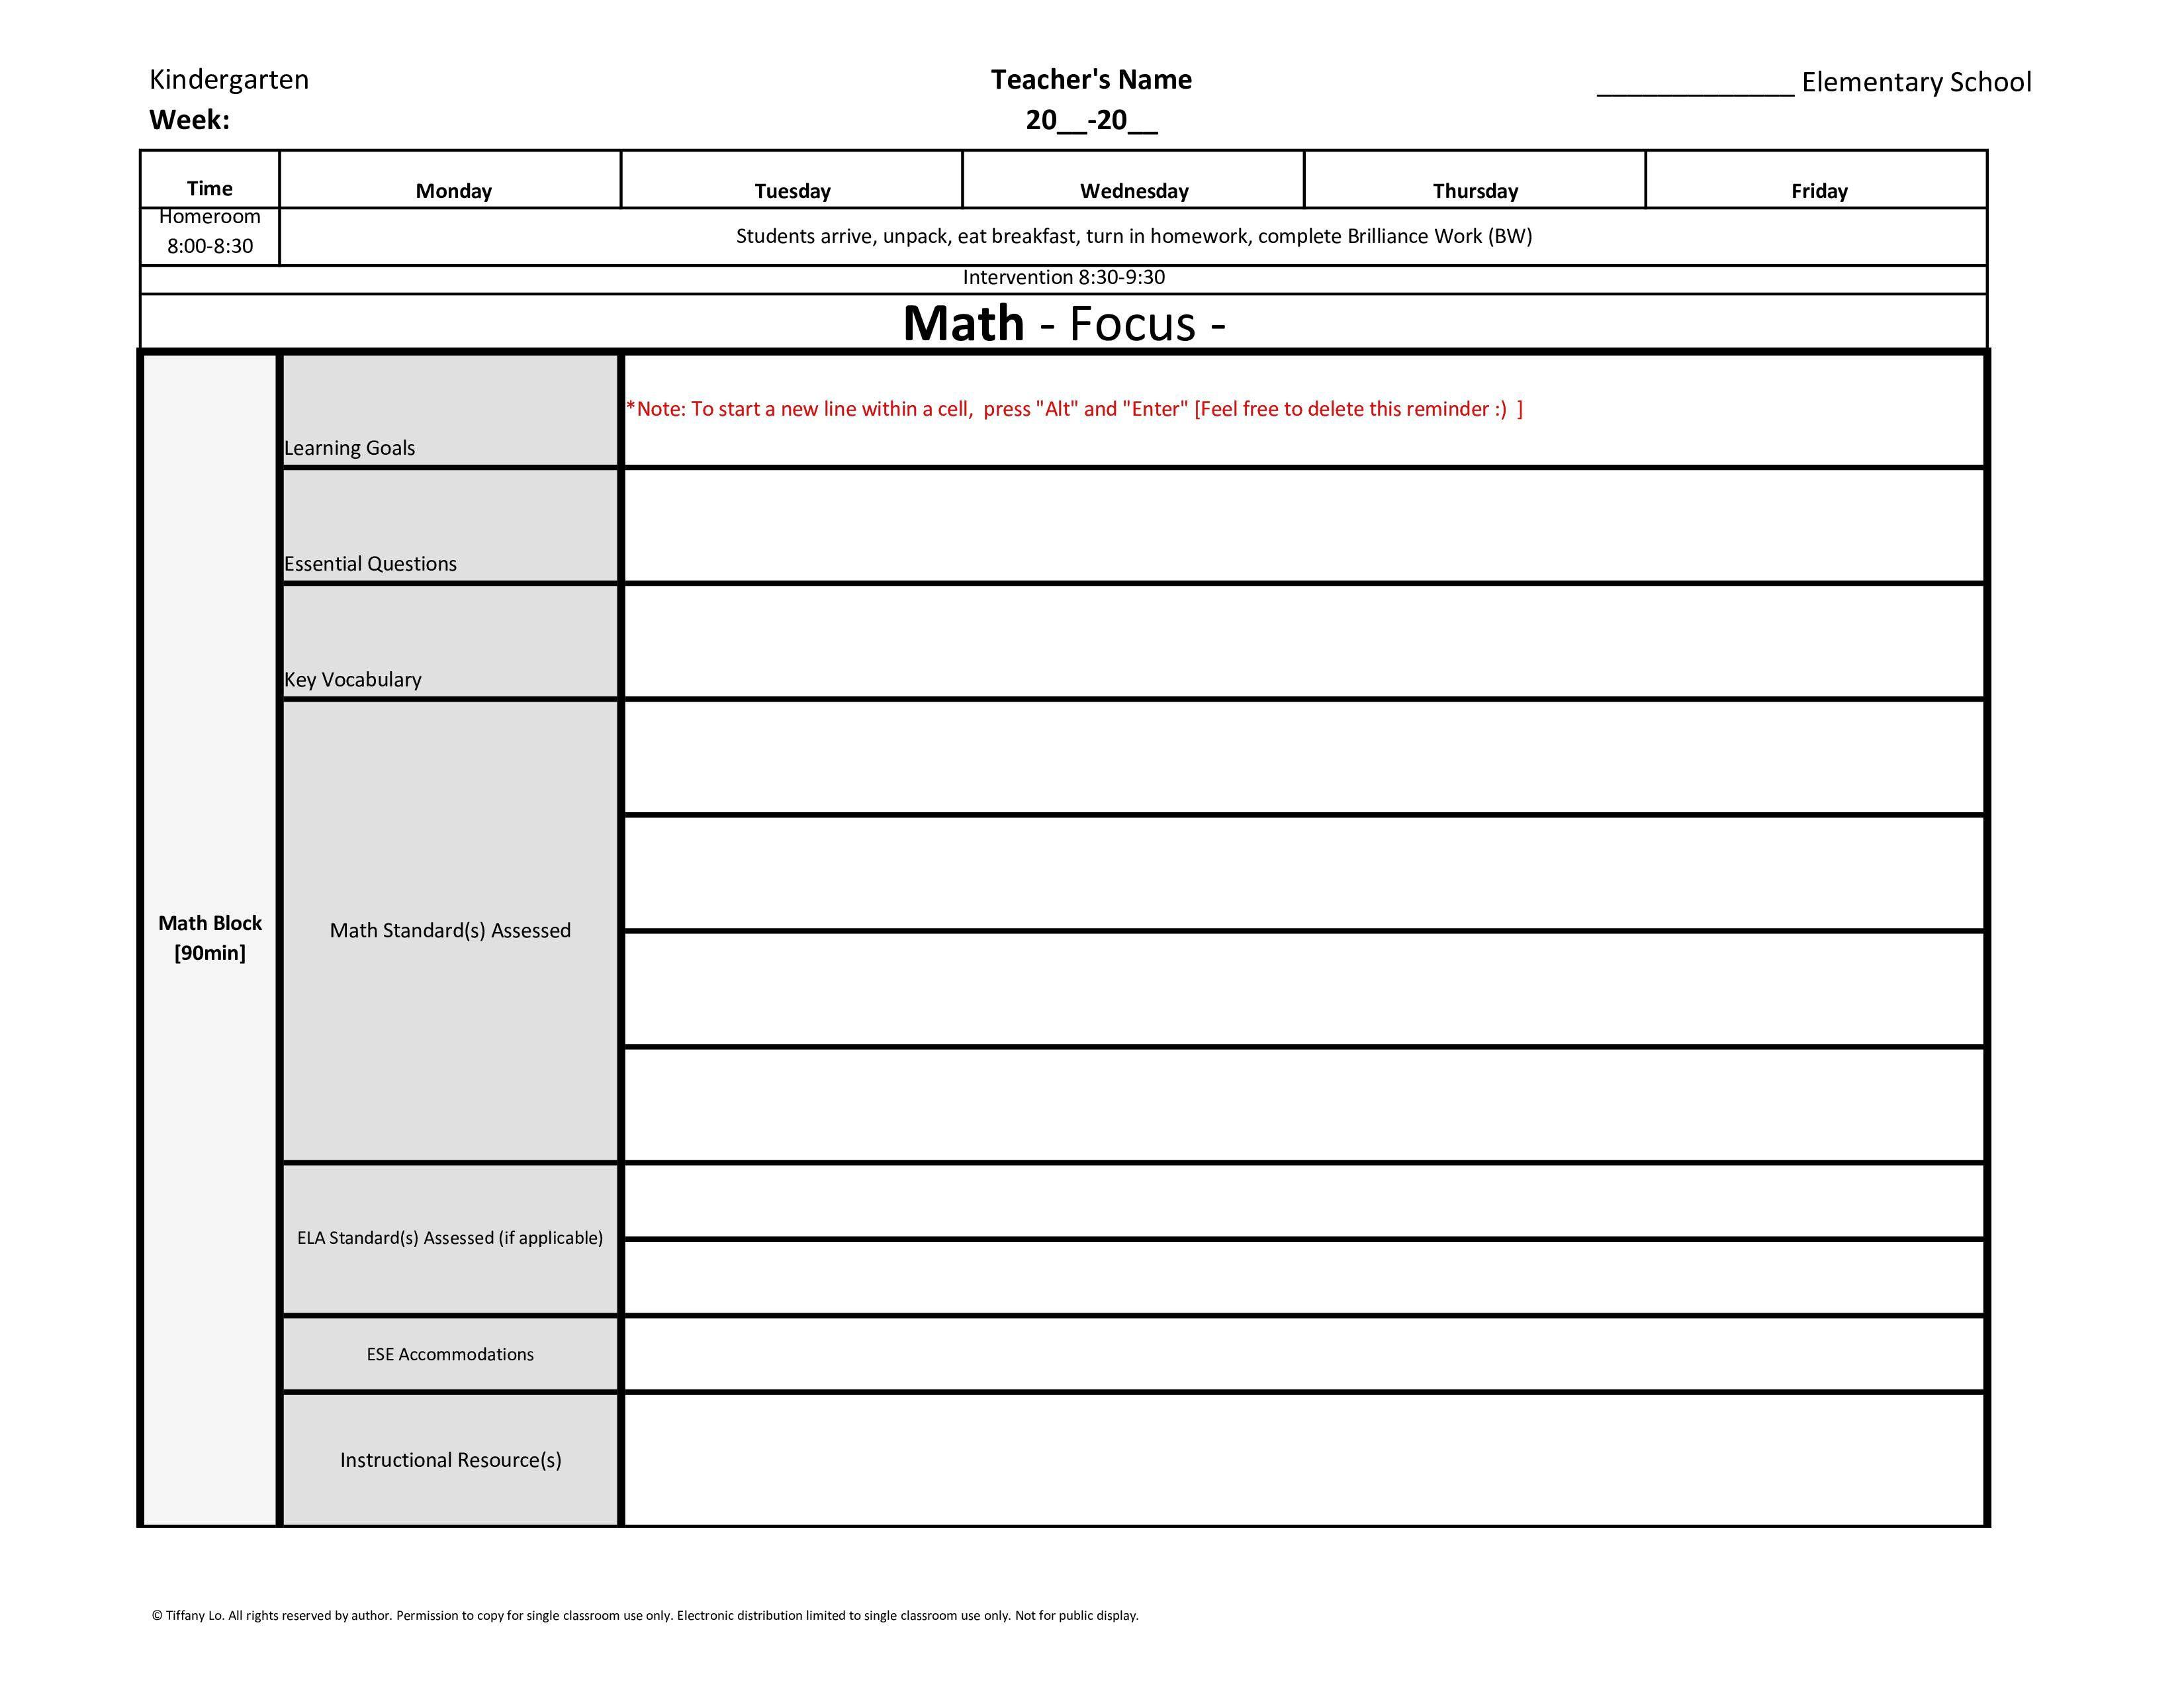 003 Astounding Lesson Plan Template Free Highest Clarity  Weekly Printable Editable Preschool FormatFull